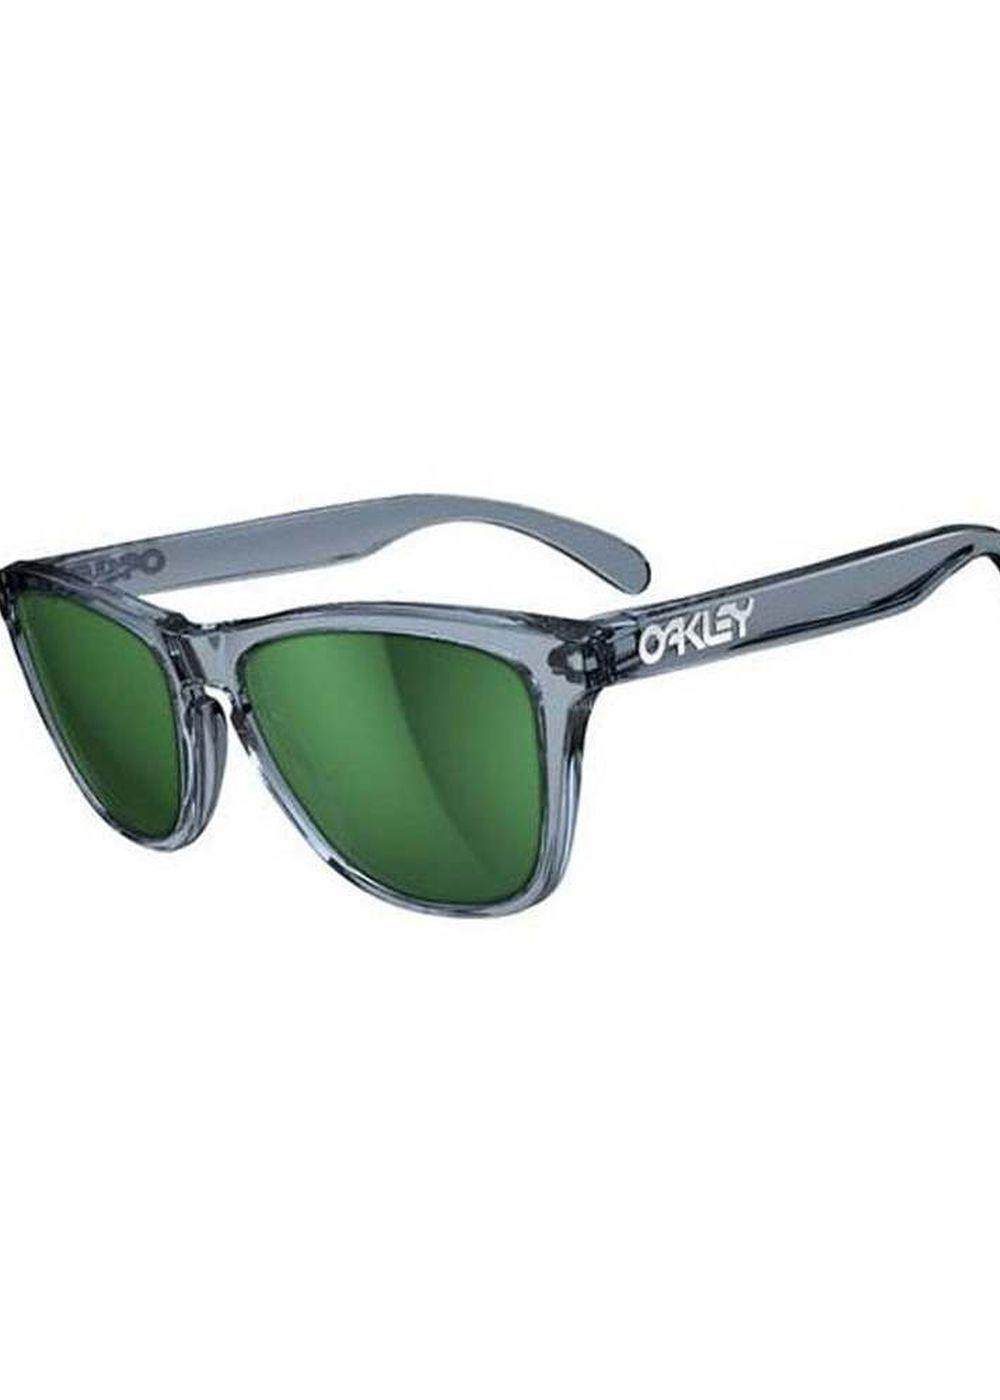 OAKLEY FROGSKIN SUNGLASSES Crystal Black/Emerald